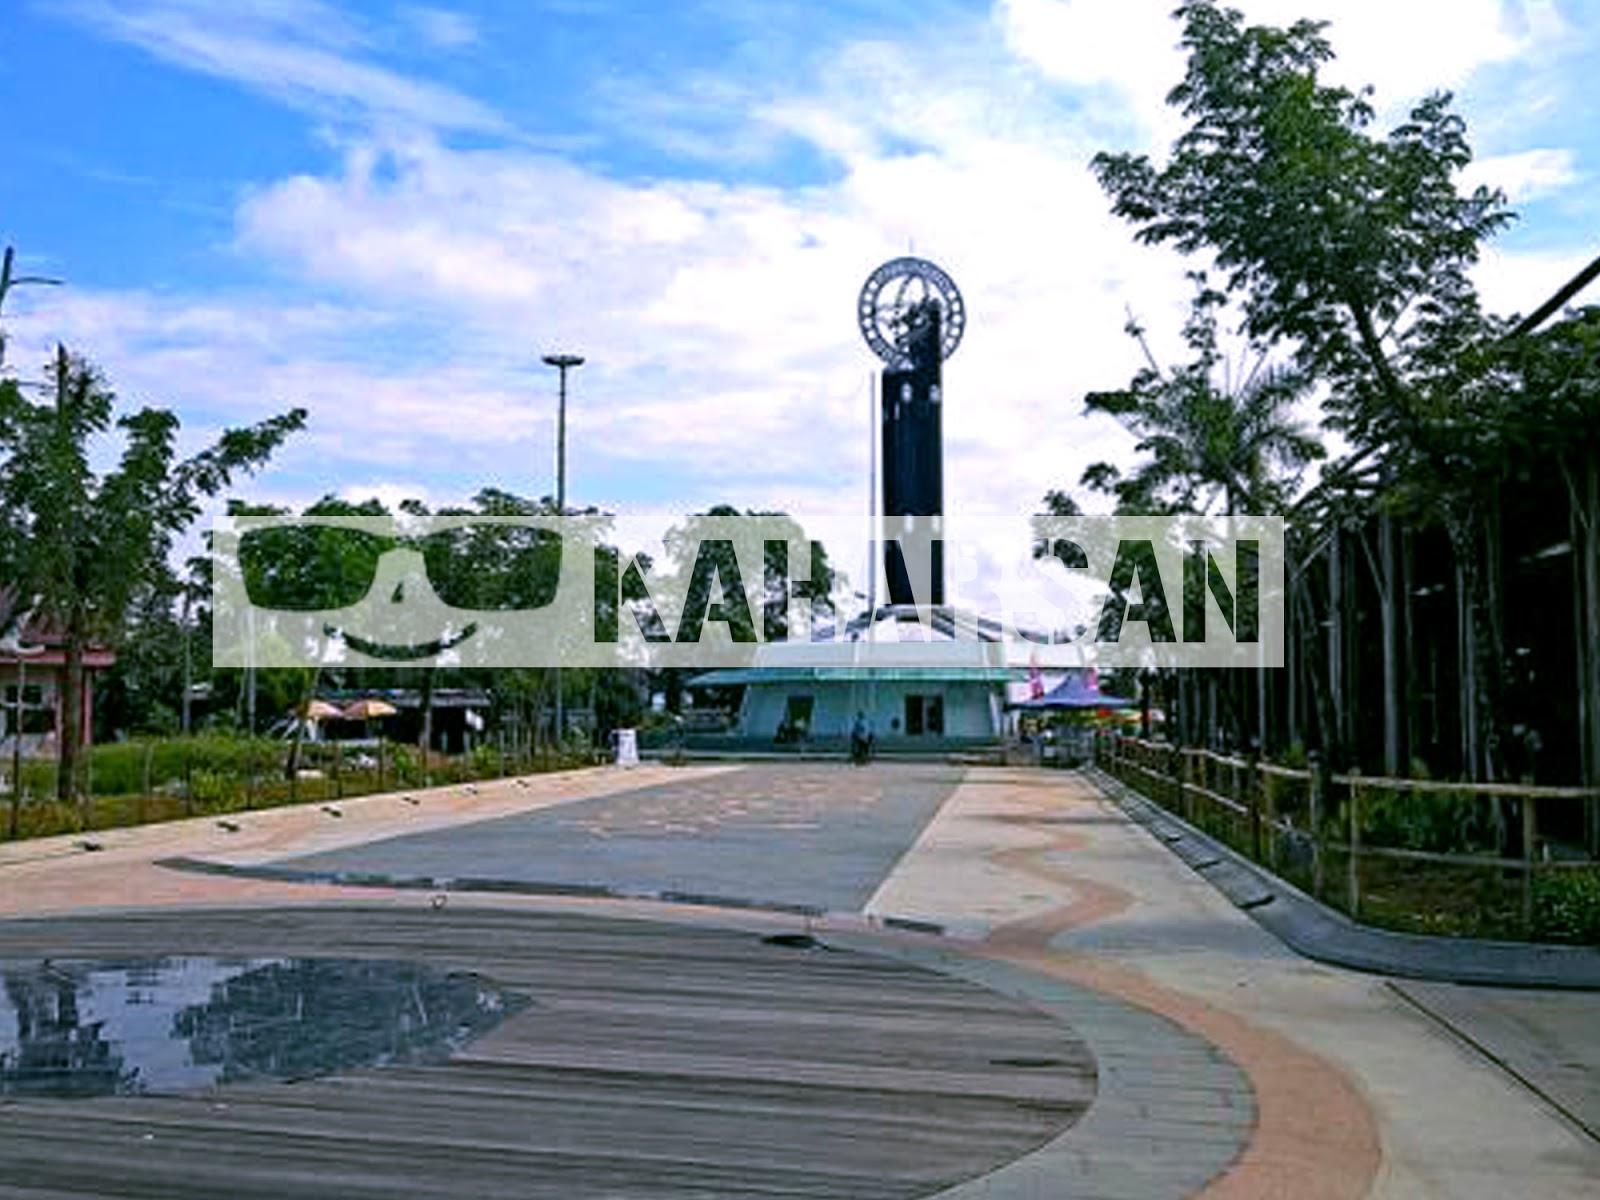 Pontianak Kota Wisata Menarik Indonesia Tugu Khatulistiwa Equator Monument Berada